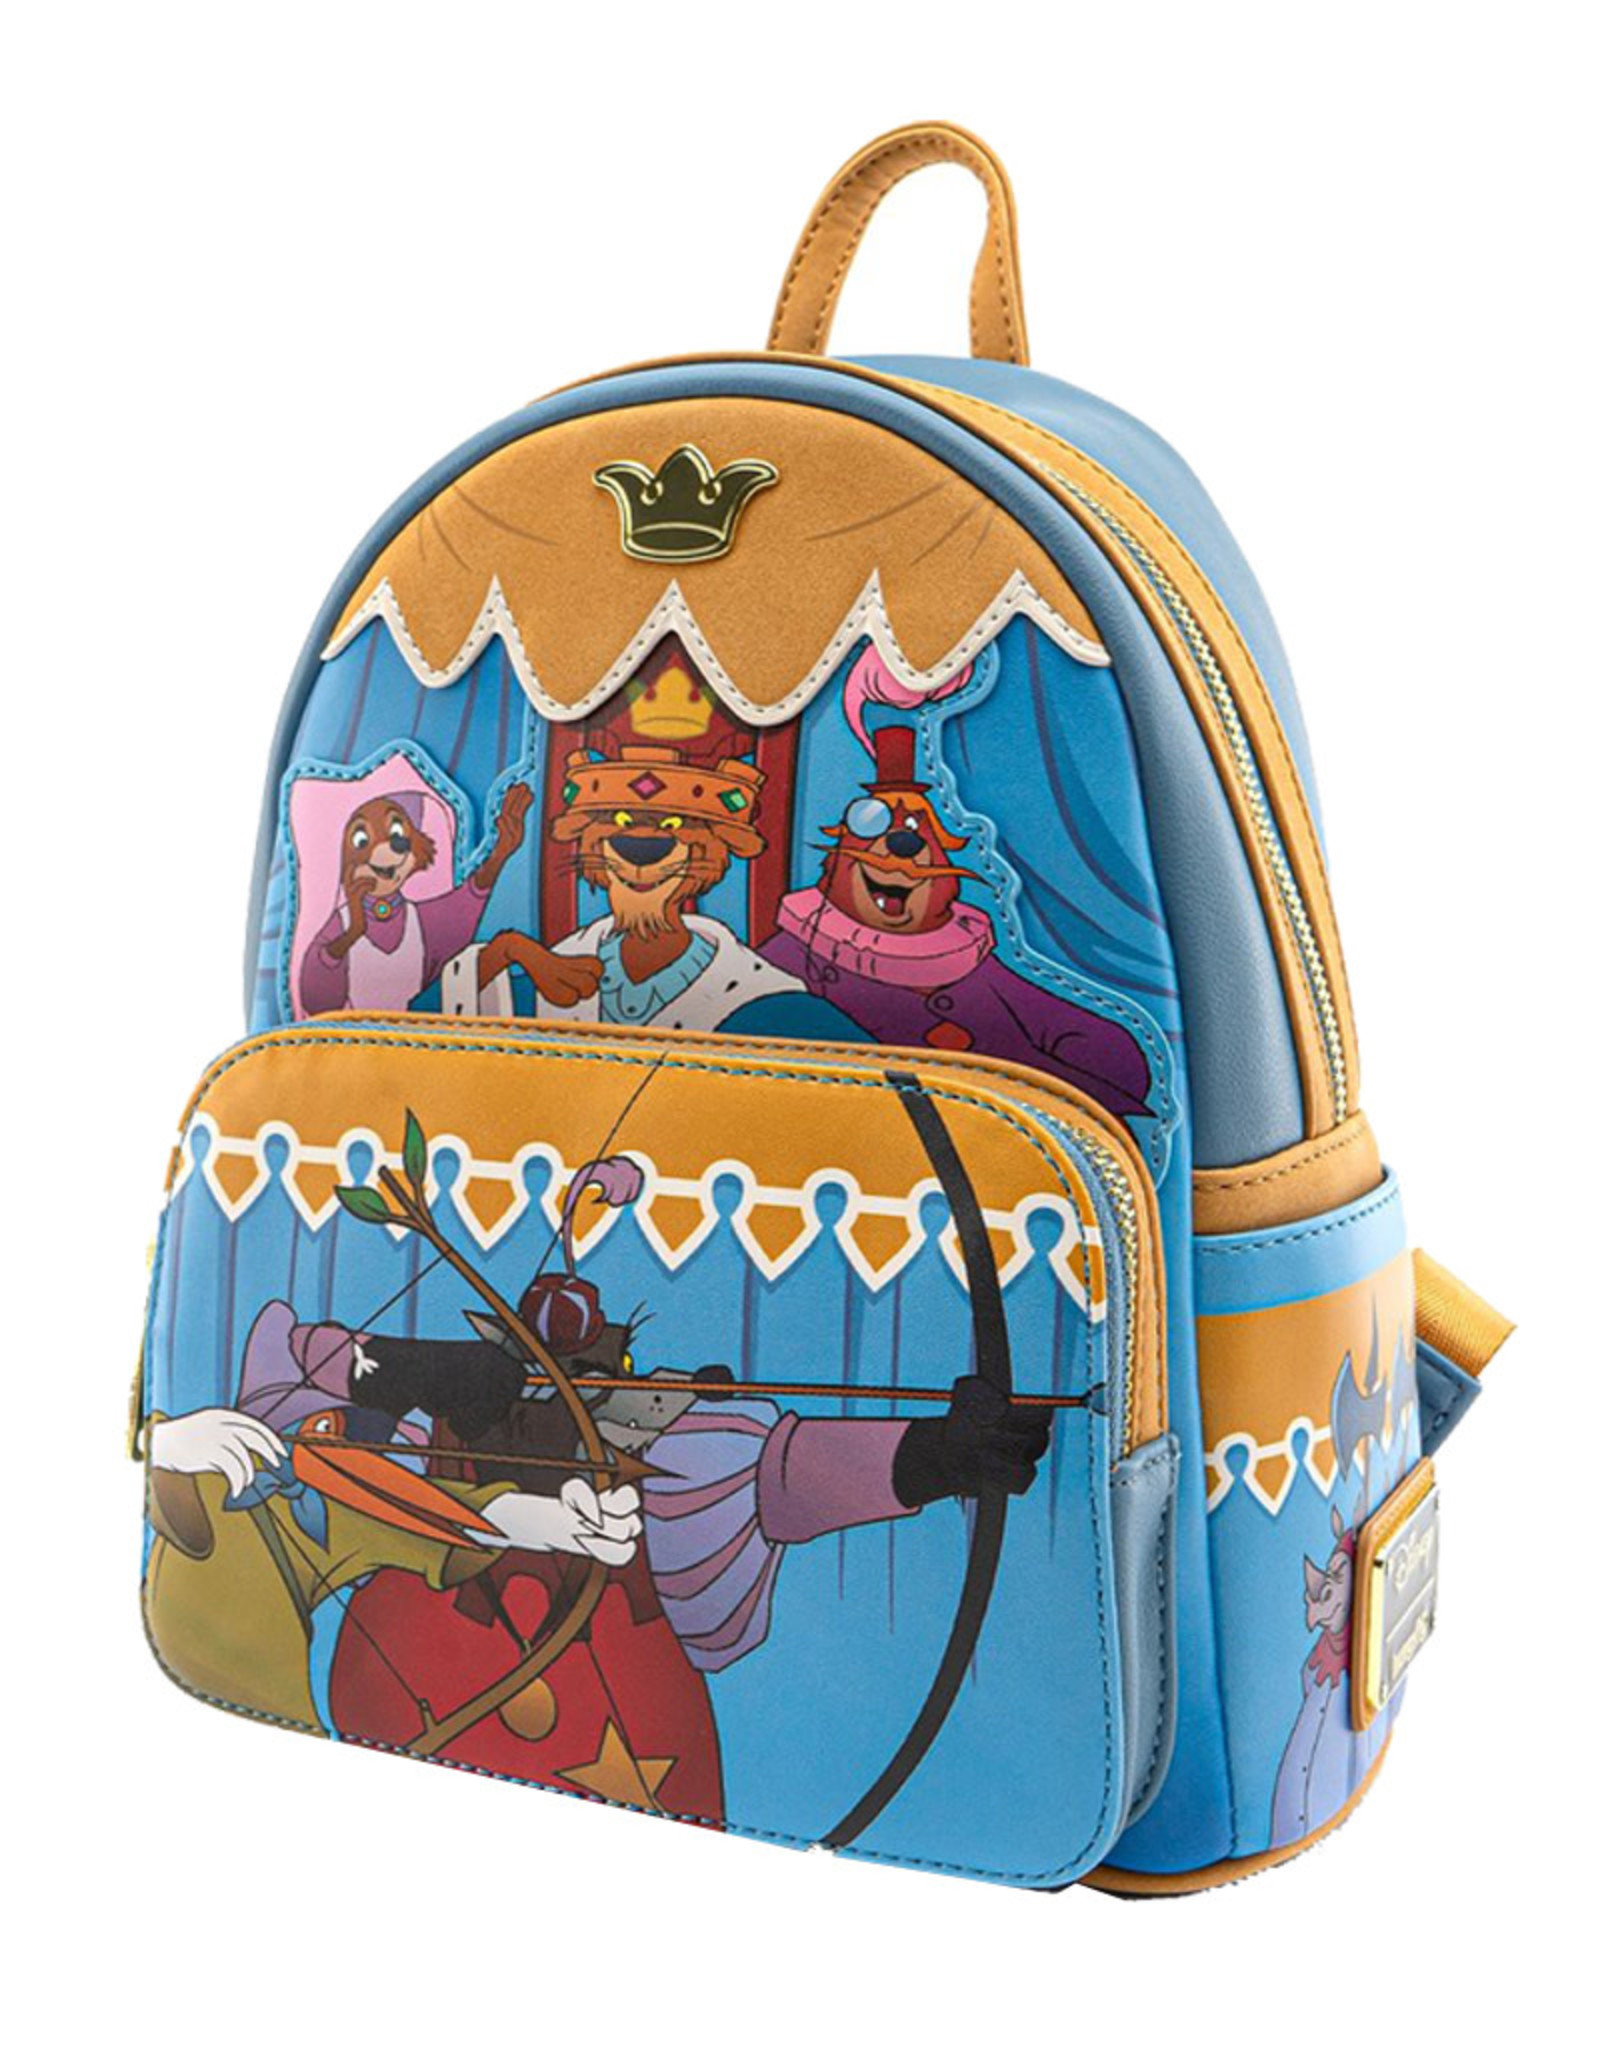 Disney Disney ( Loungefly Mini Backpack ) Robin Hood